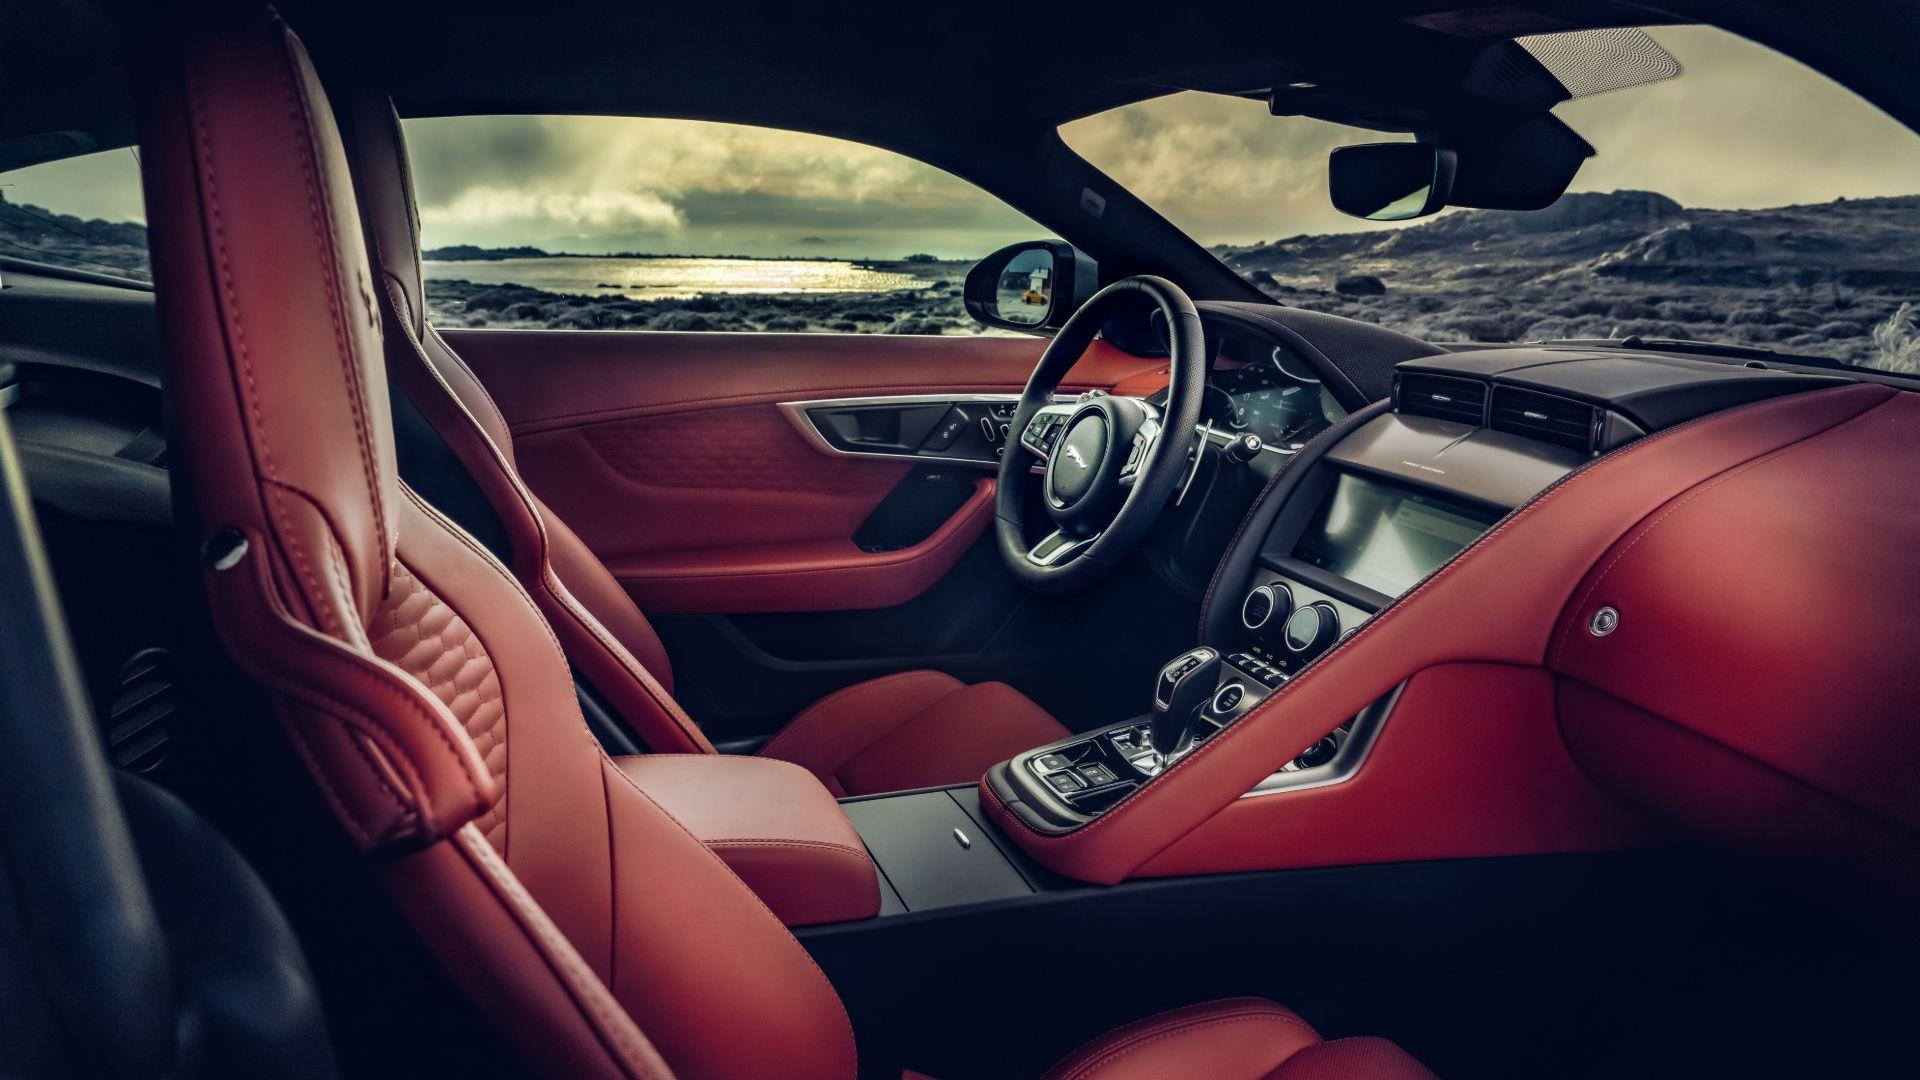 Jaguars with SOTA get integrated Spotify